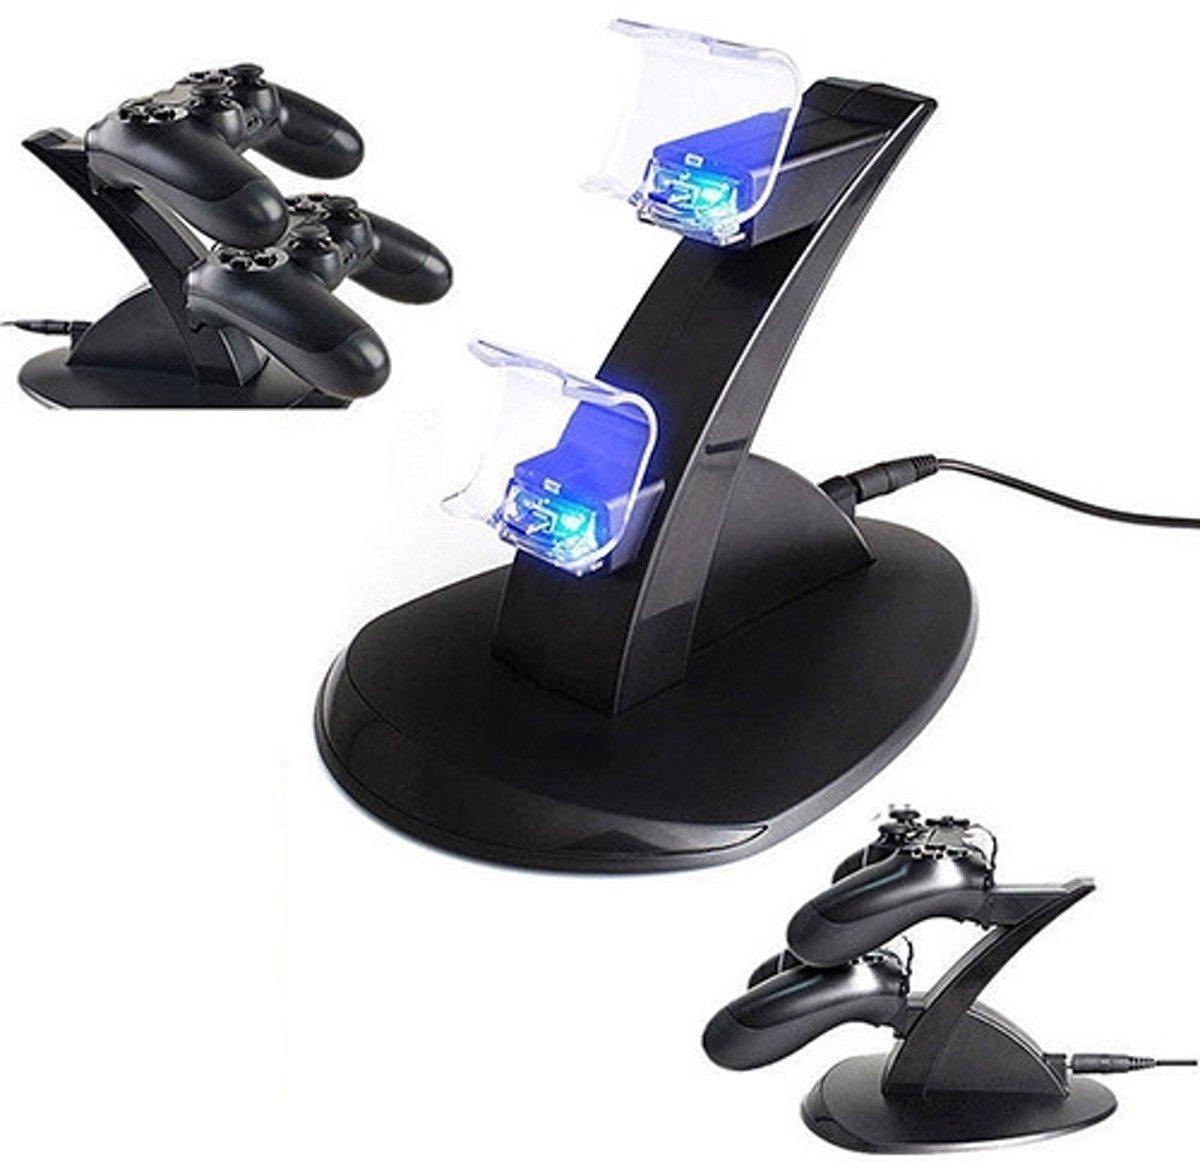 Dock voor Playstation 4 PS4 controllers met LED verlichting / Oplader Oplaadstation